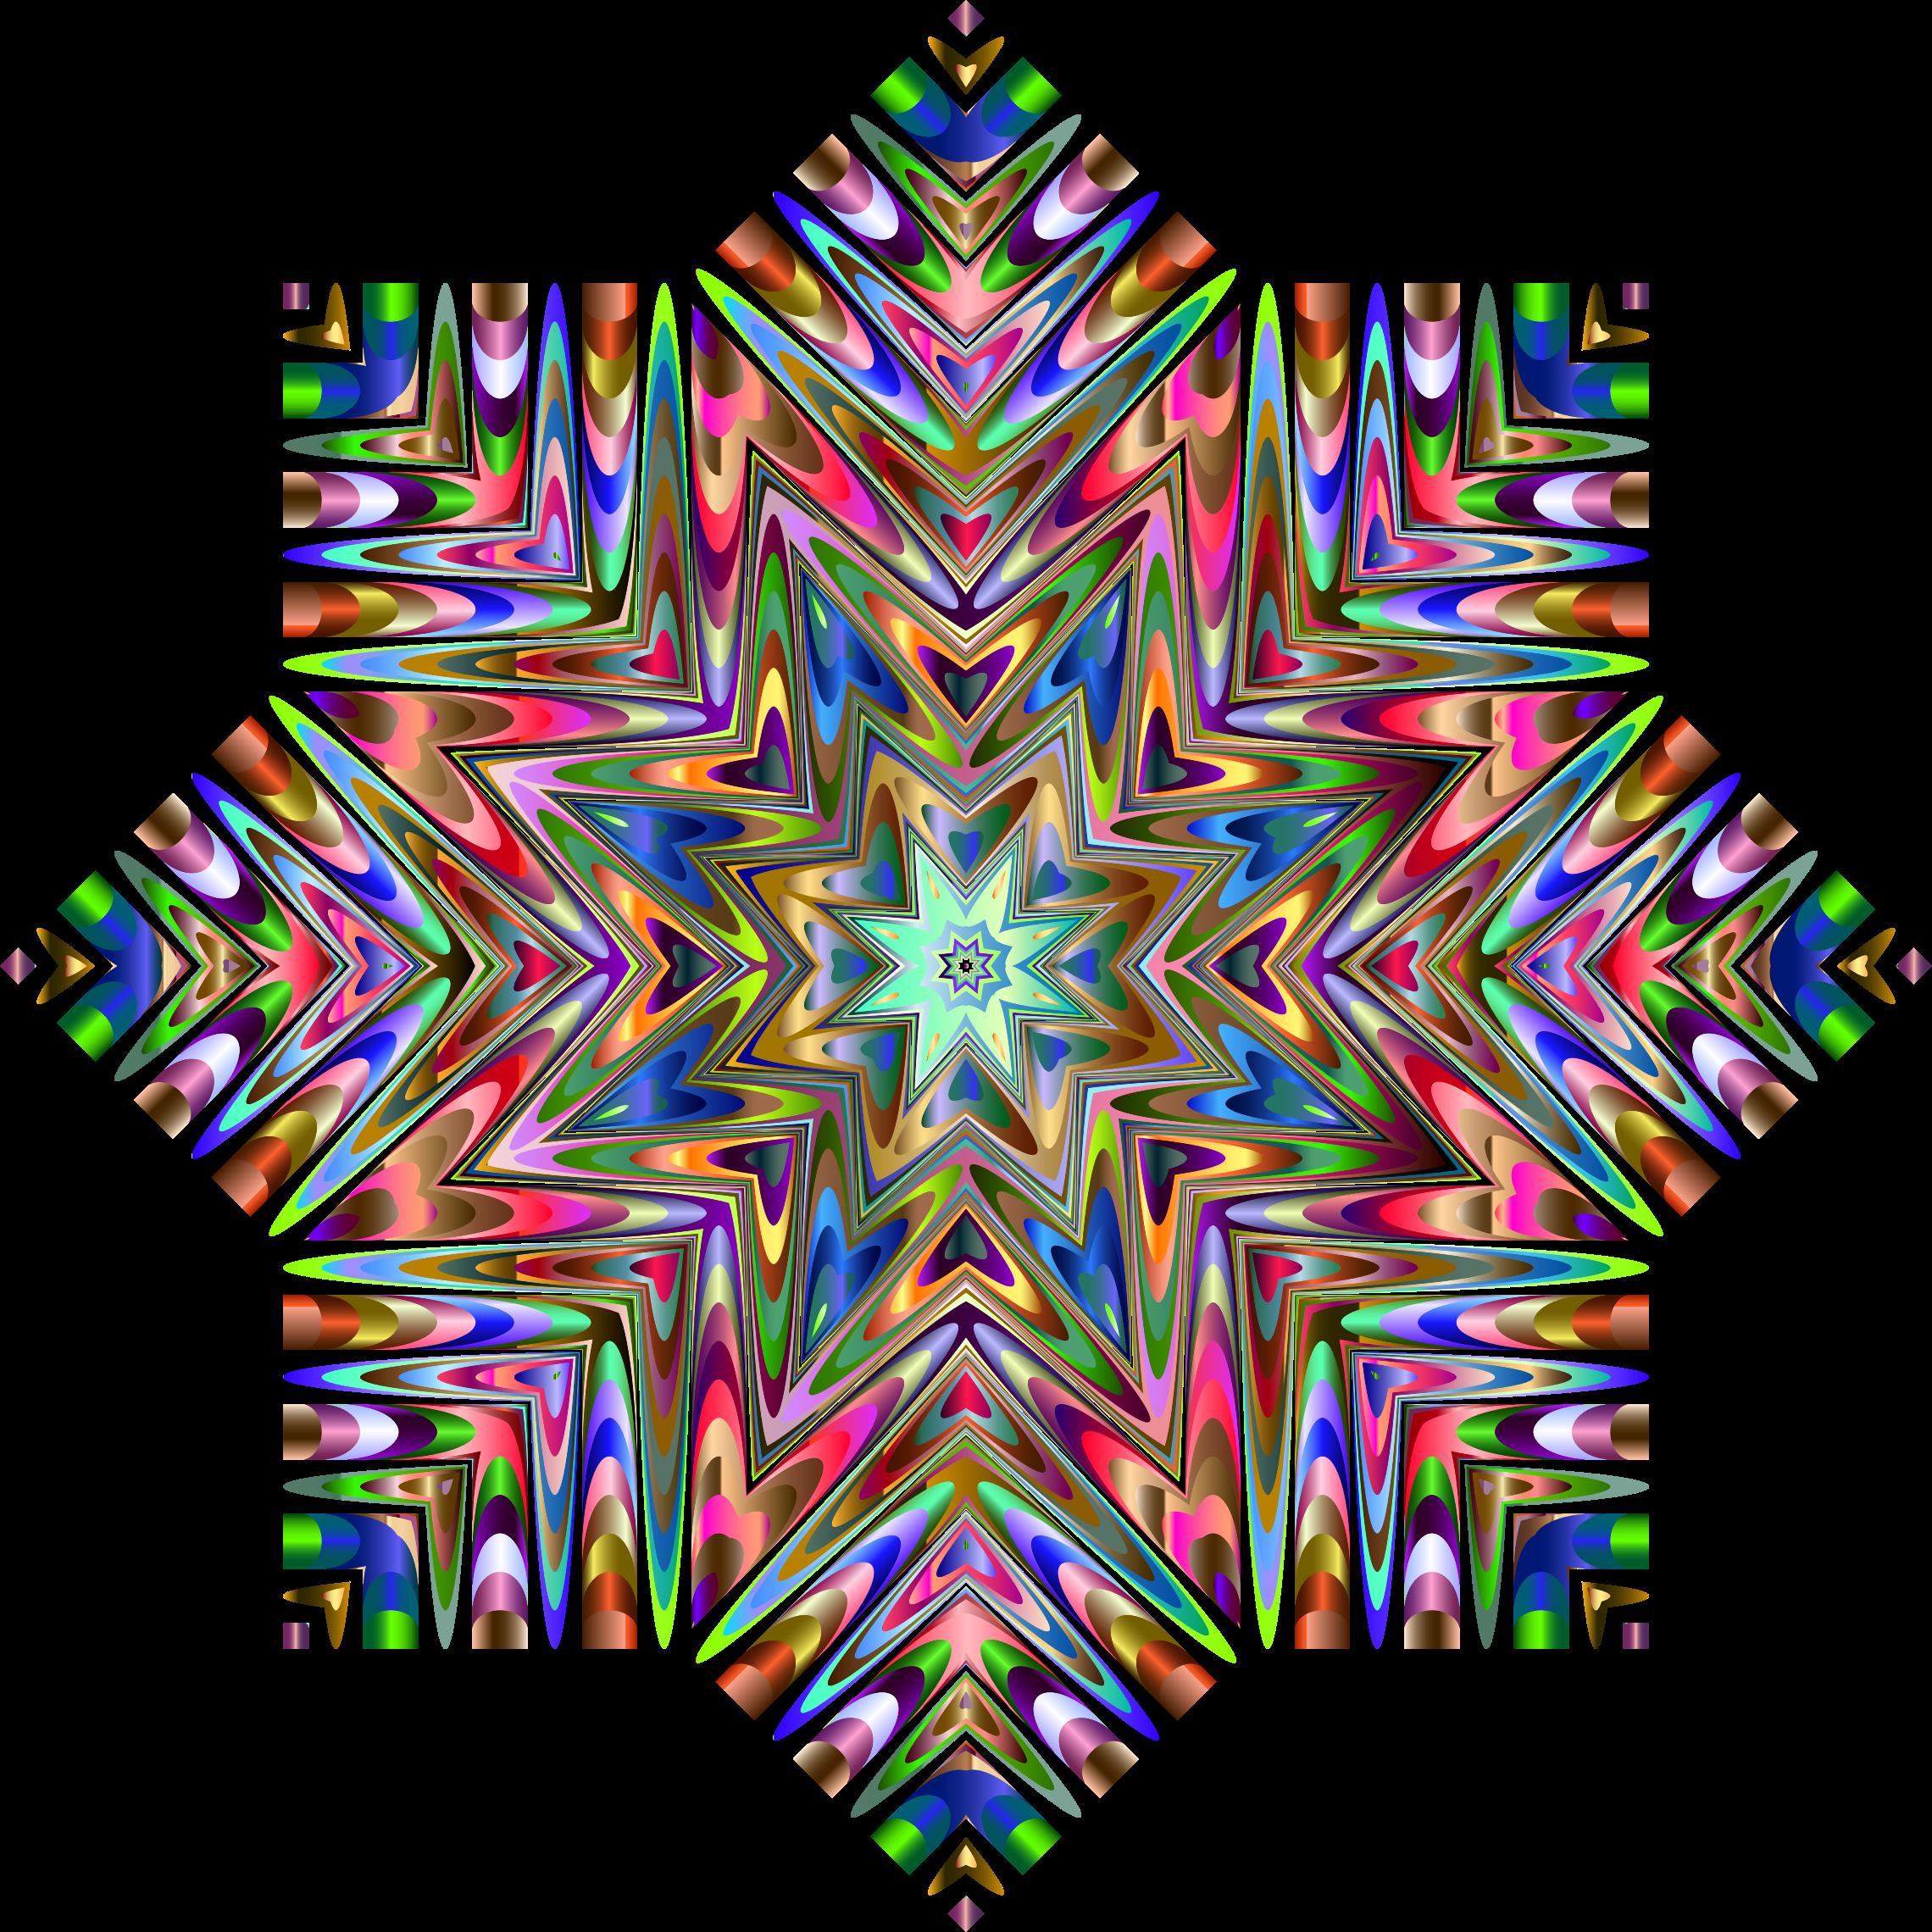 Rainbow snowflake clipart graphic transparent Clipart - Chromatic Snowflake graphic transparent